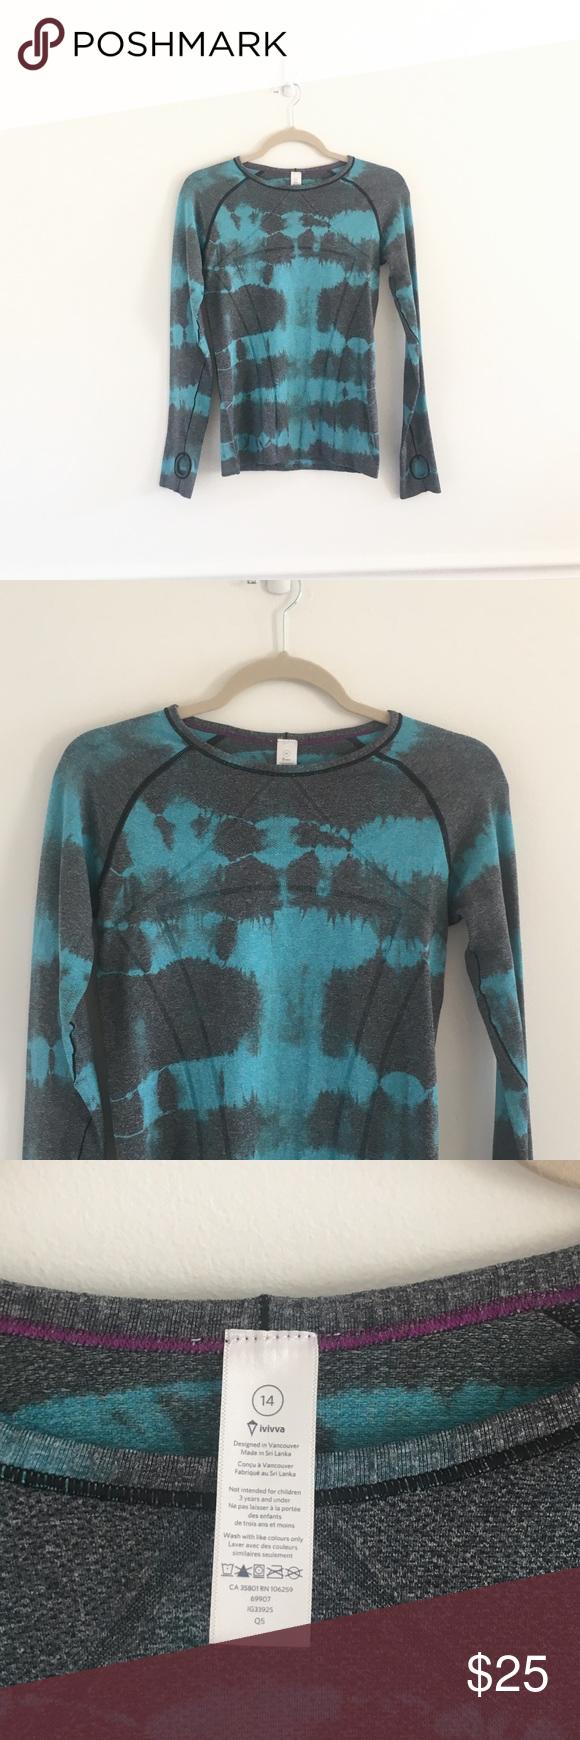 Girls Ivivva Lululemon Fly Tech Tie Dye Shirt Tie Dye Shirt Ivivva Shirts For Girls [ 1740 x 580 Pixel ]